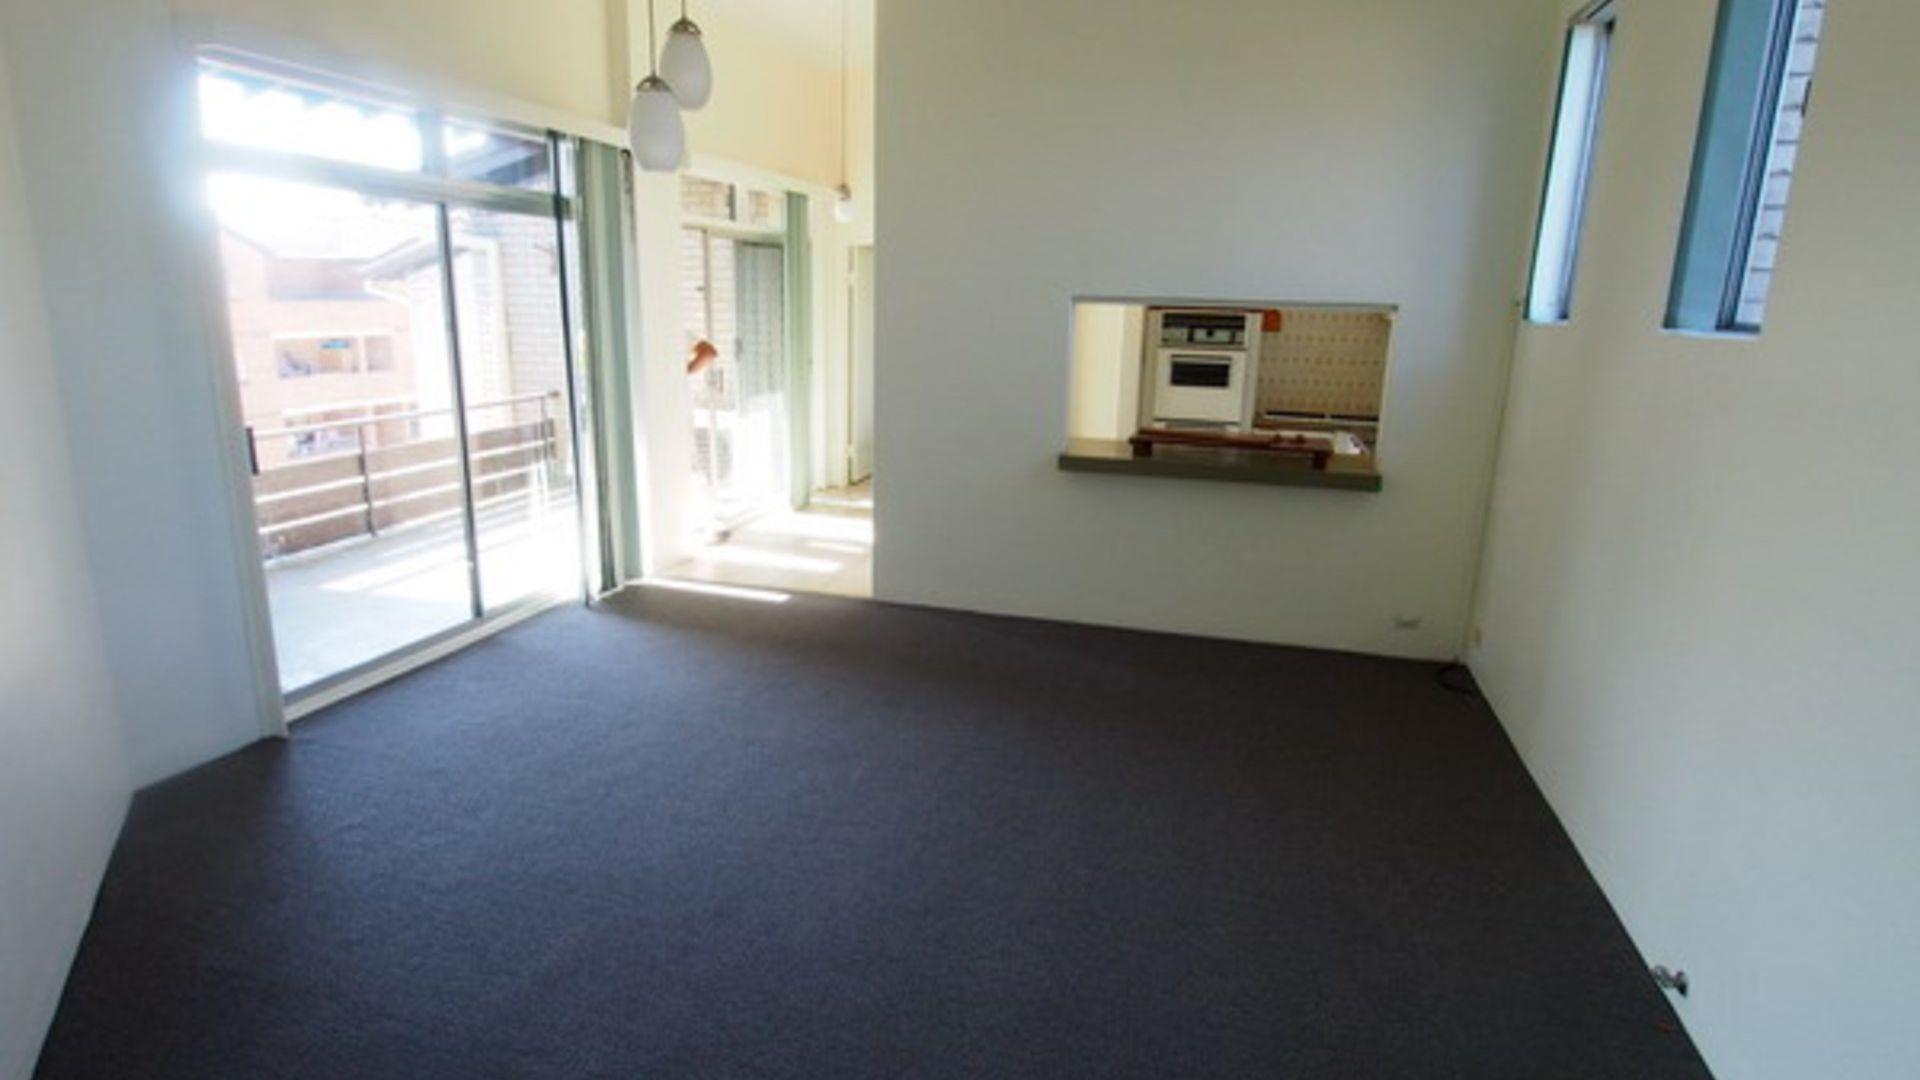 21A/147 Wellington Rd, Sefton NSW 2162, Image 1